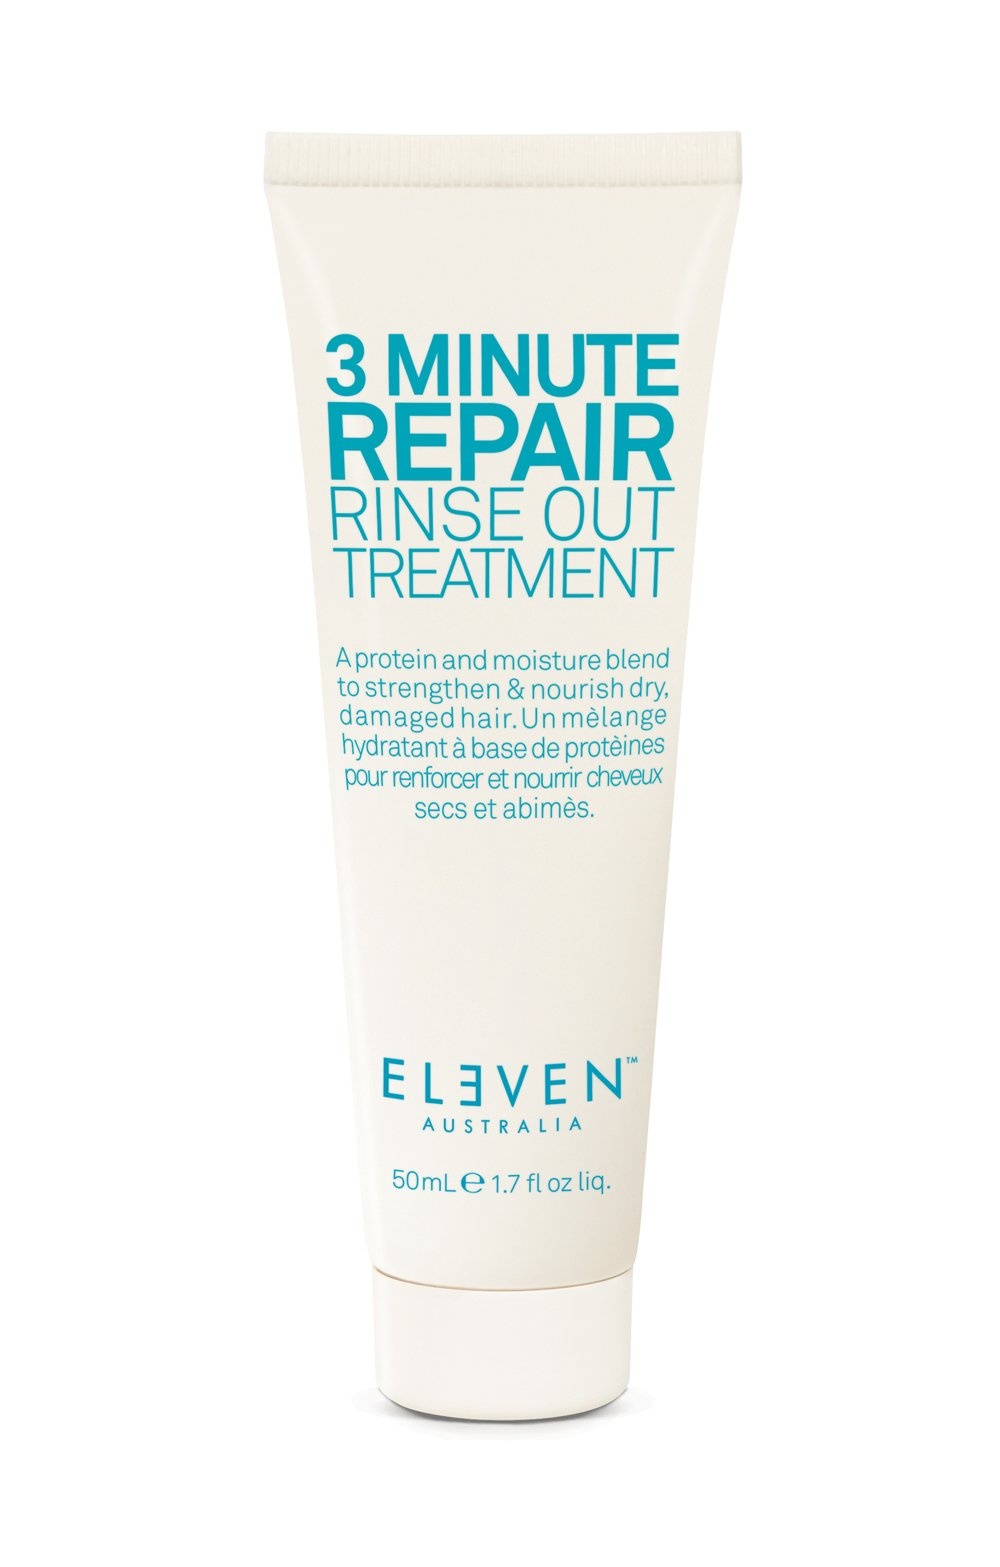 Eleven Australia 3 Minute Rinse Out Repair Treatment